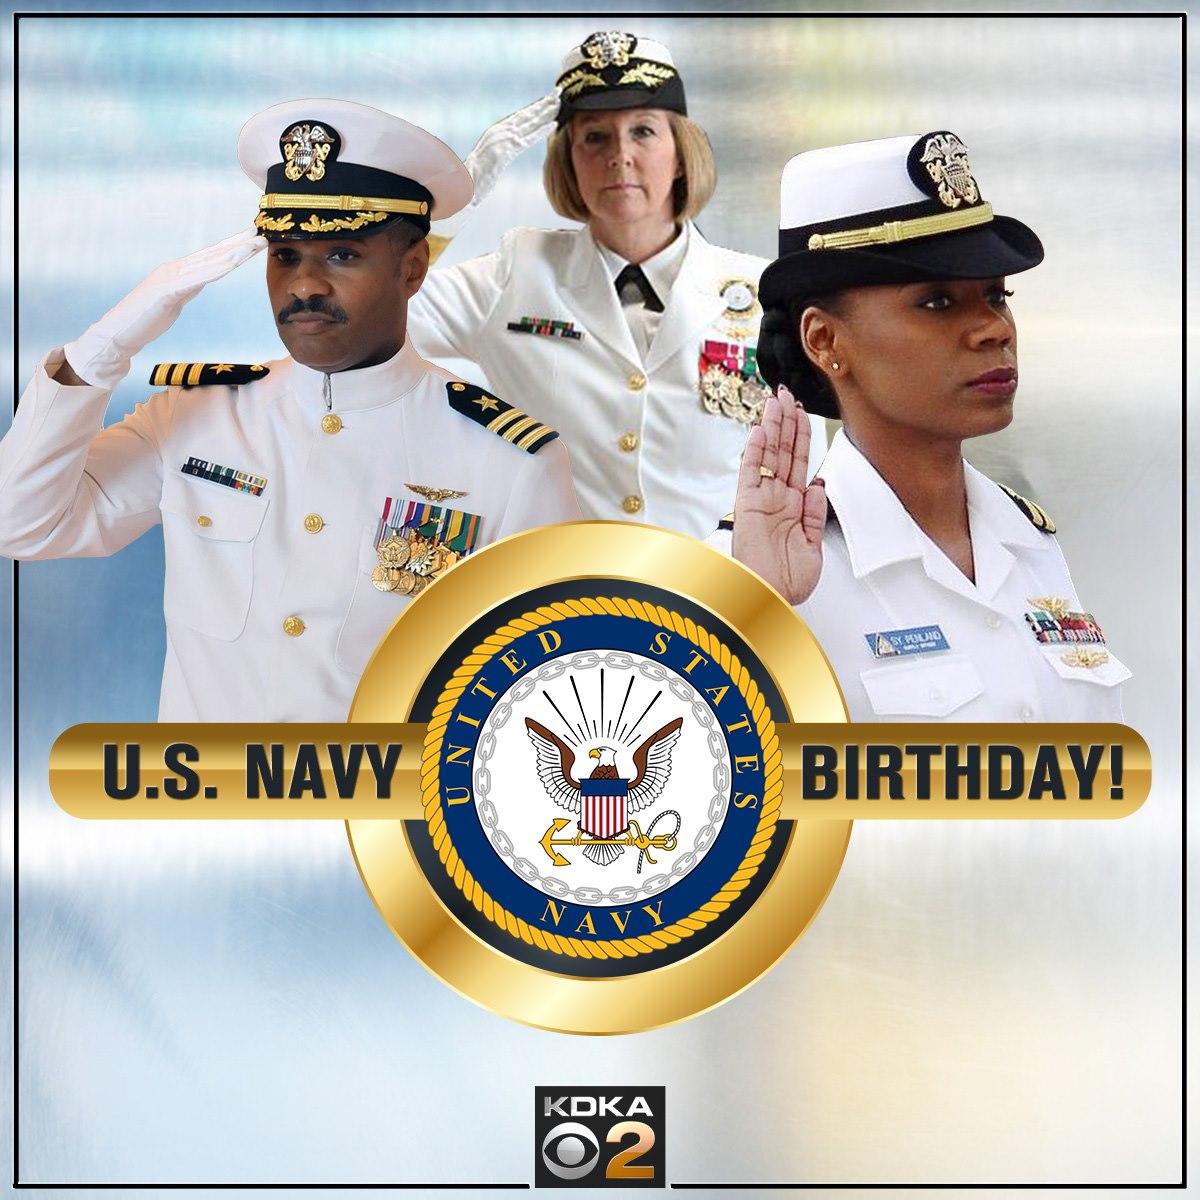 @KDKA's photo on U.S. Navy